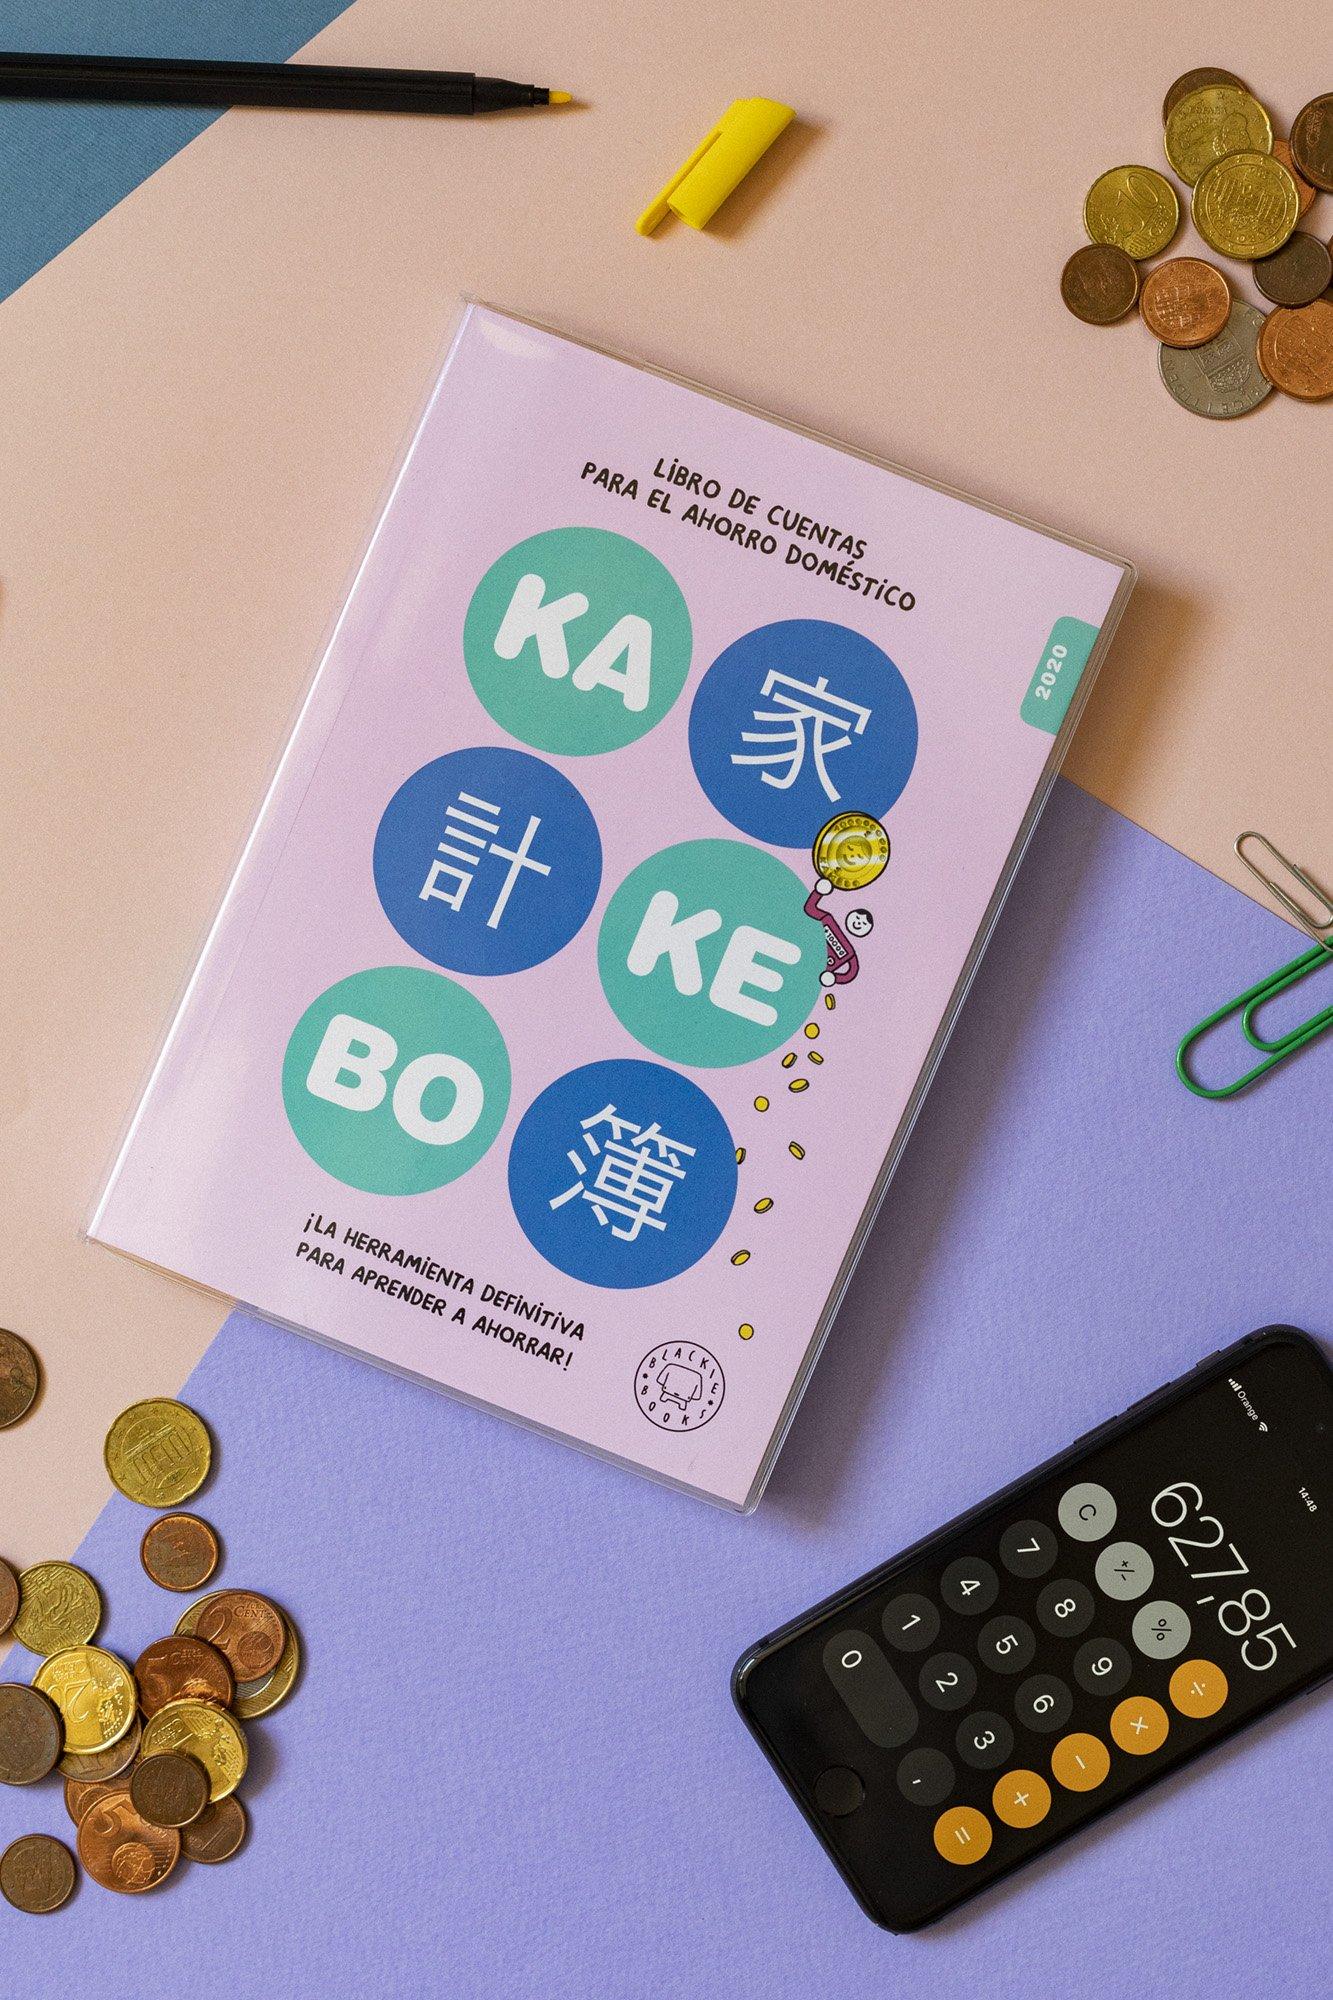 Kakebo Blackie Books 2020 – Blackie Books